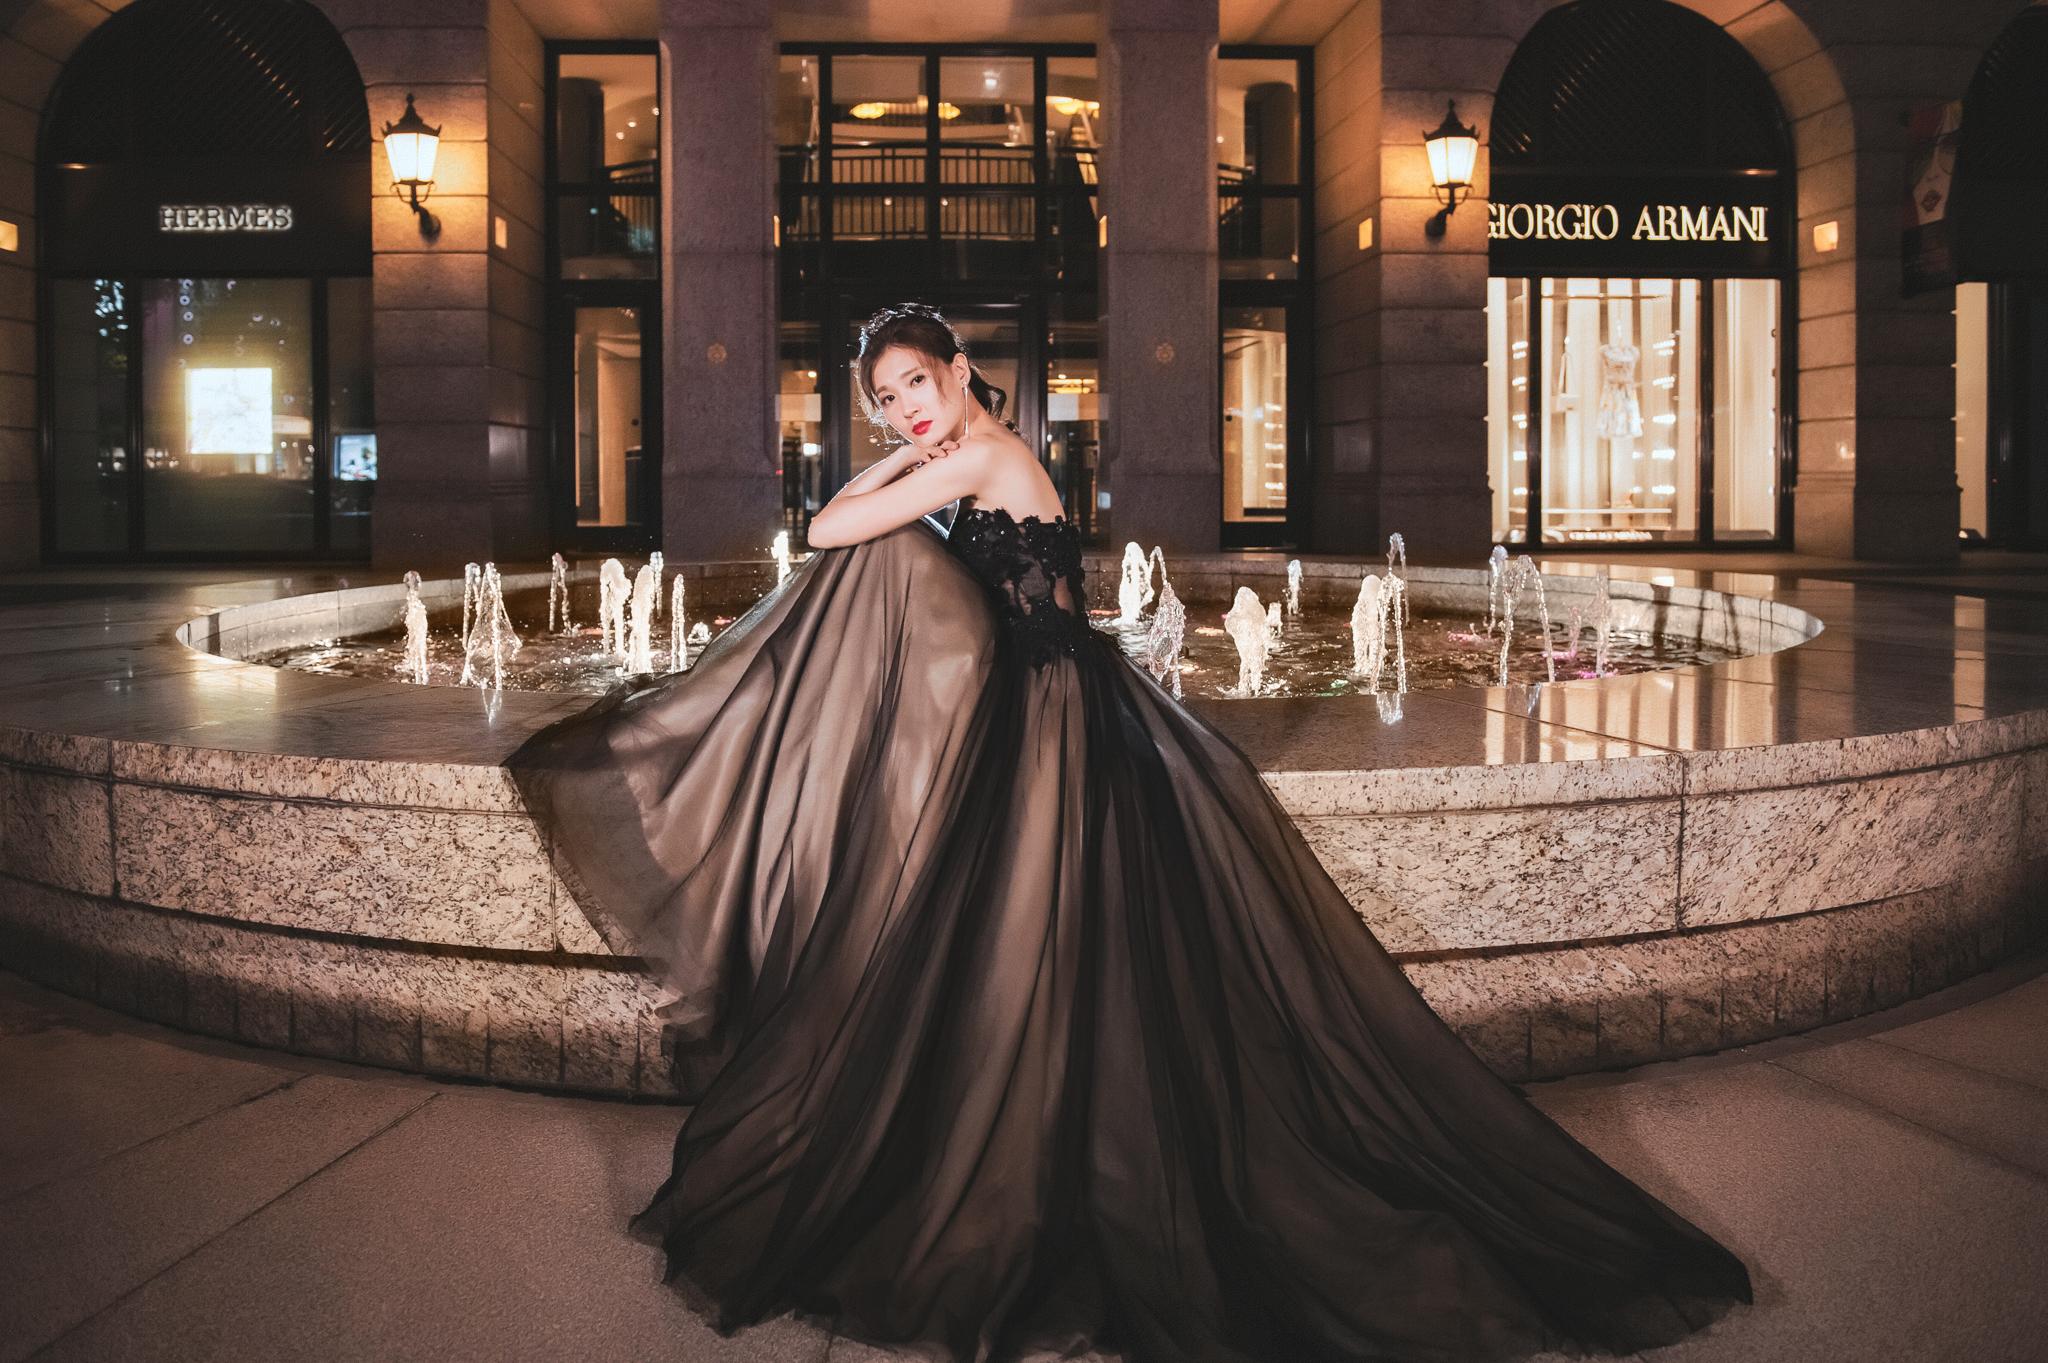 Easternwedding 婚禮影像工作室 EW JMH 居米 婚攝 台北 繡球花 陽明山 華山 婚紗